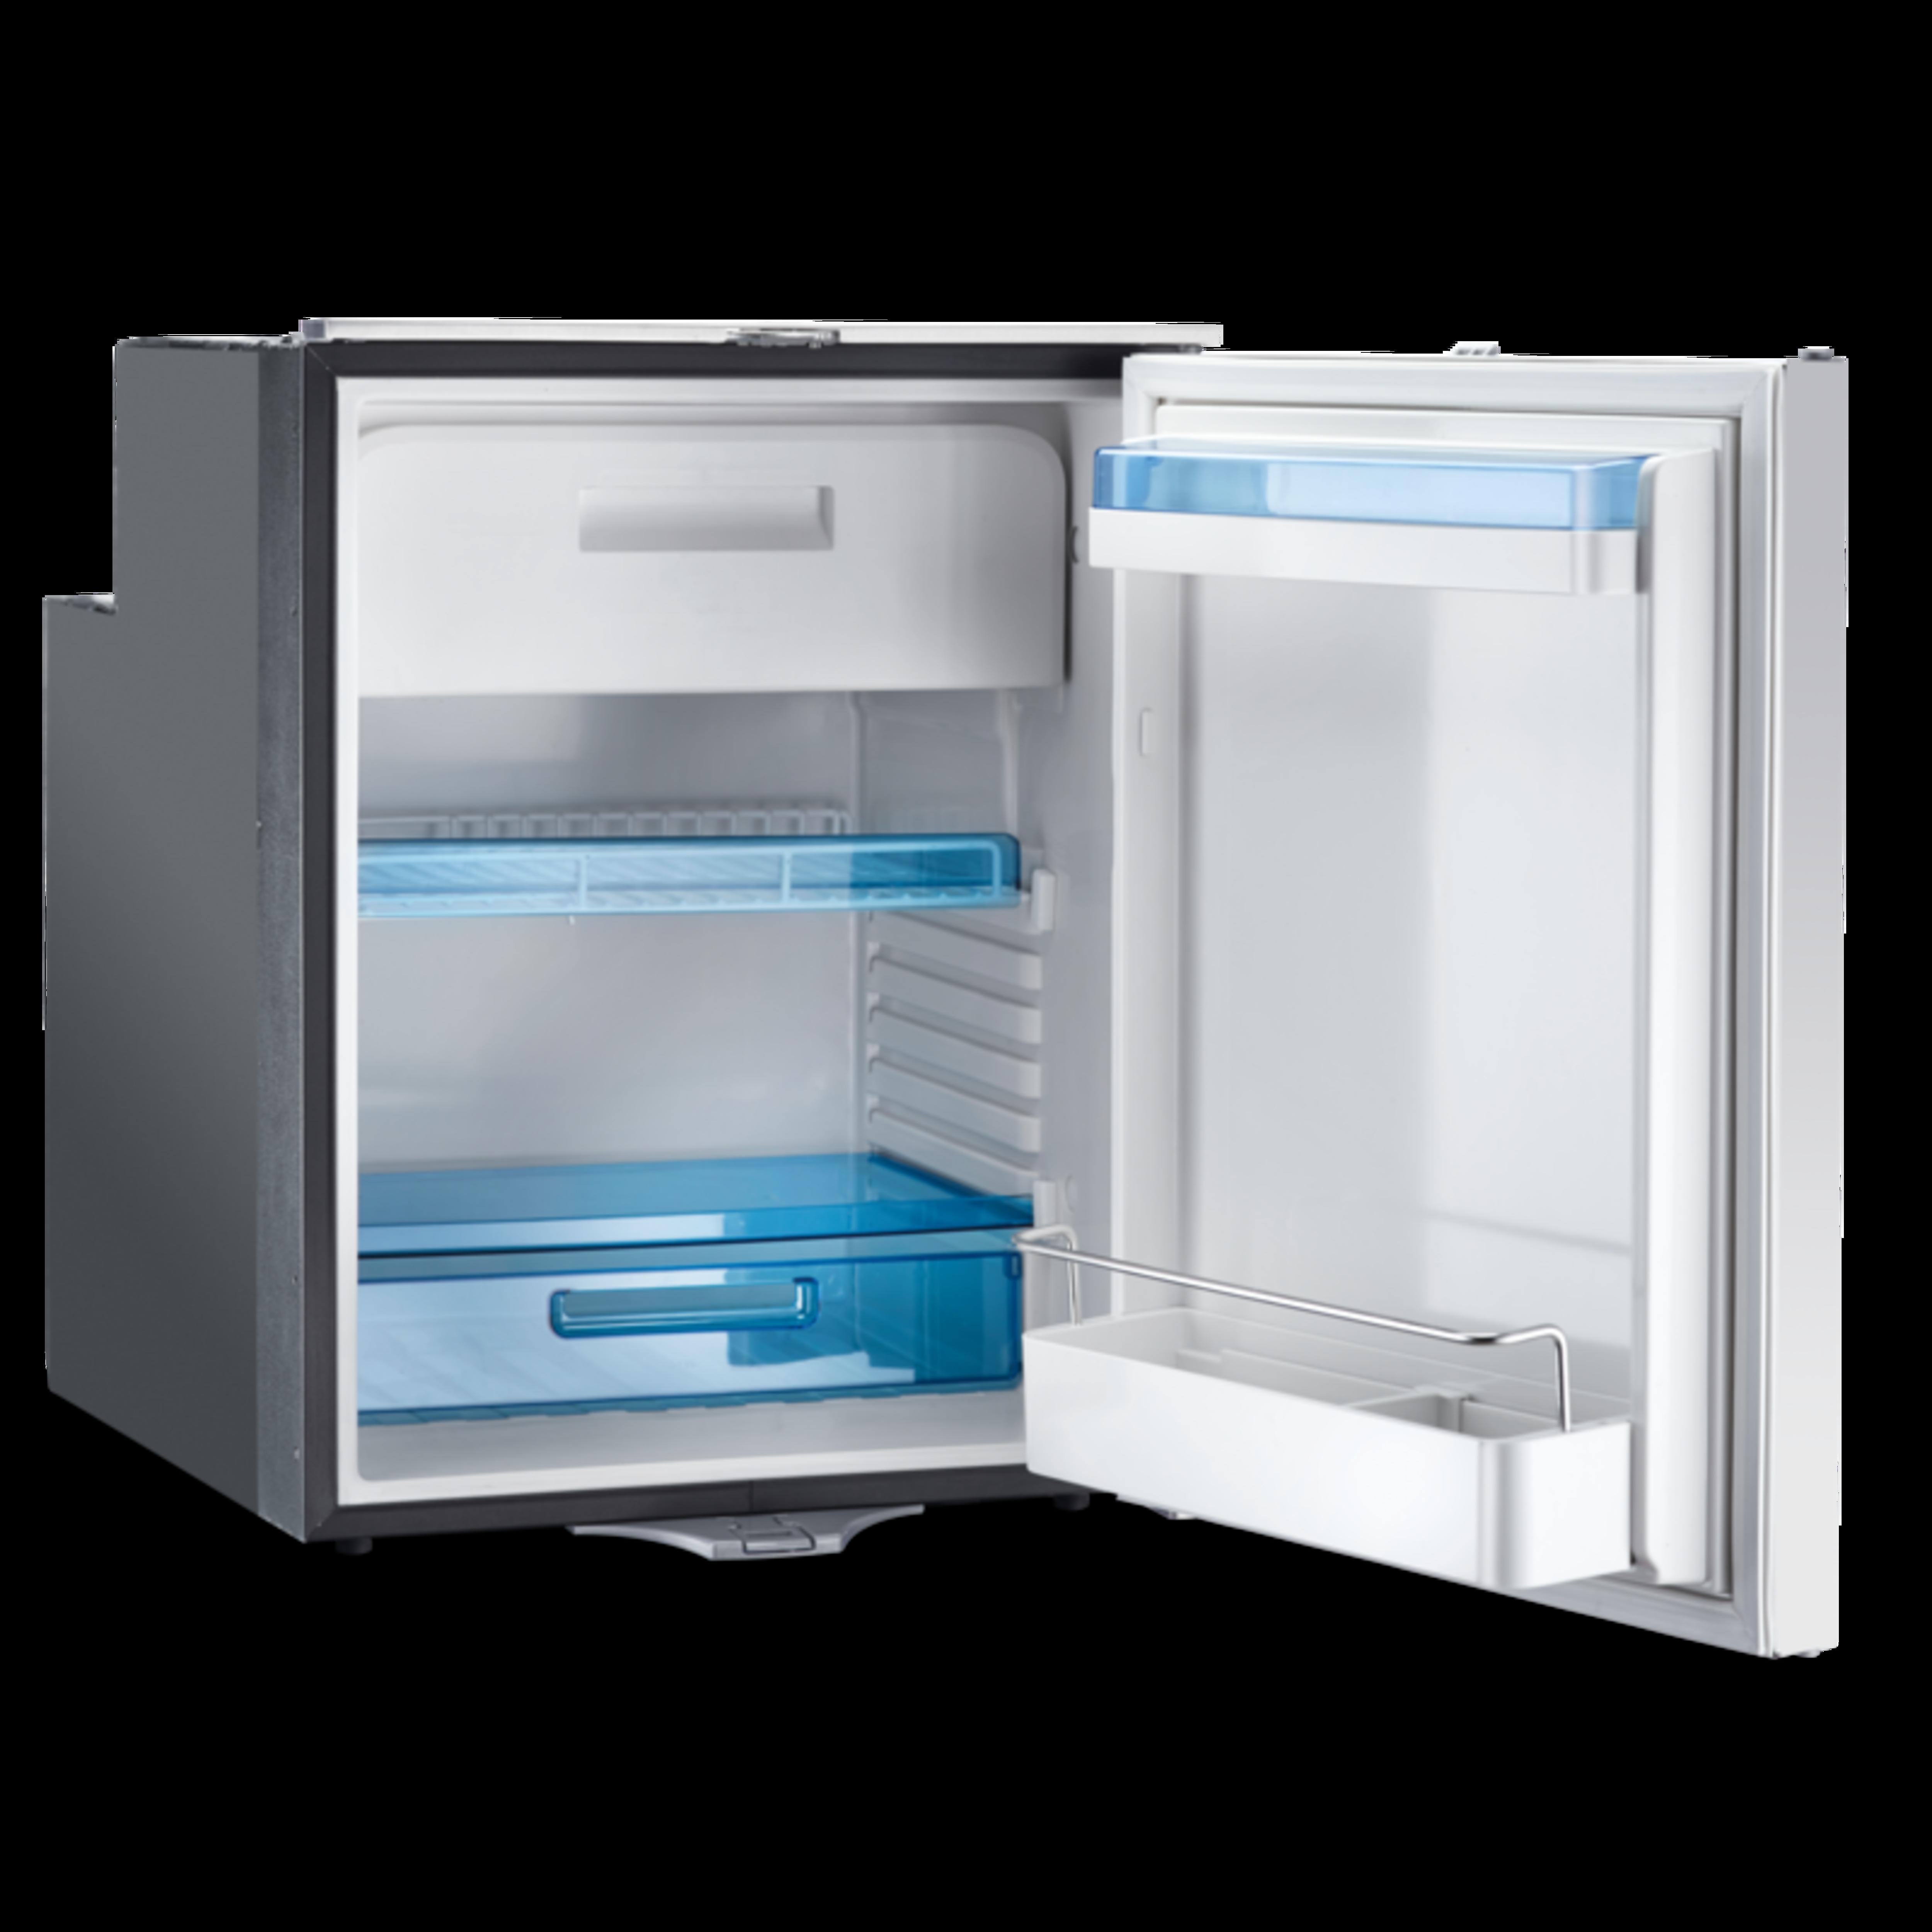 Dometic CoolMatic CRX 10 Kühlschrank Wohnmobil Boot 10 l